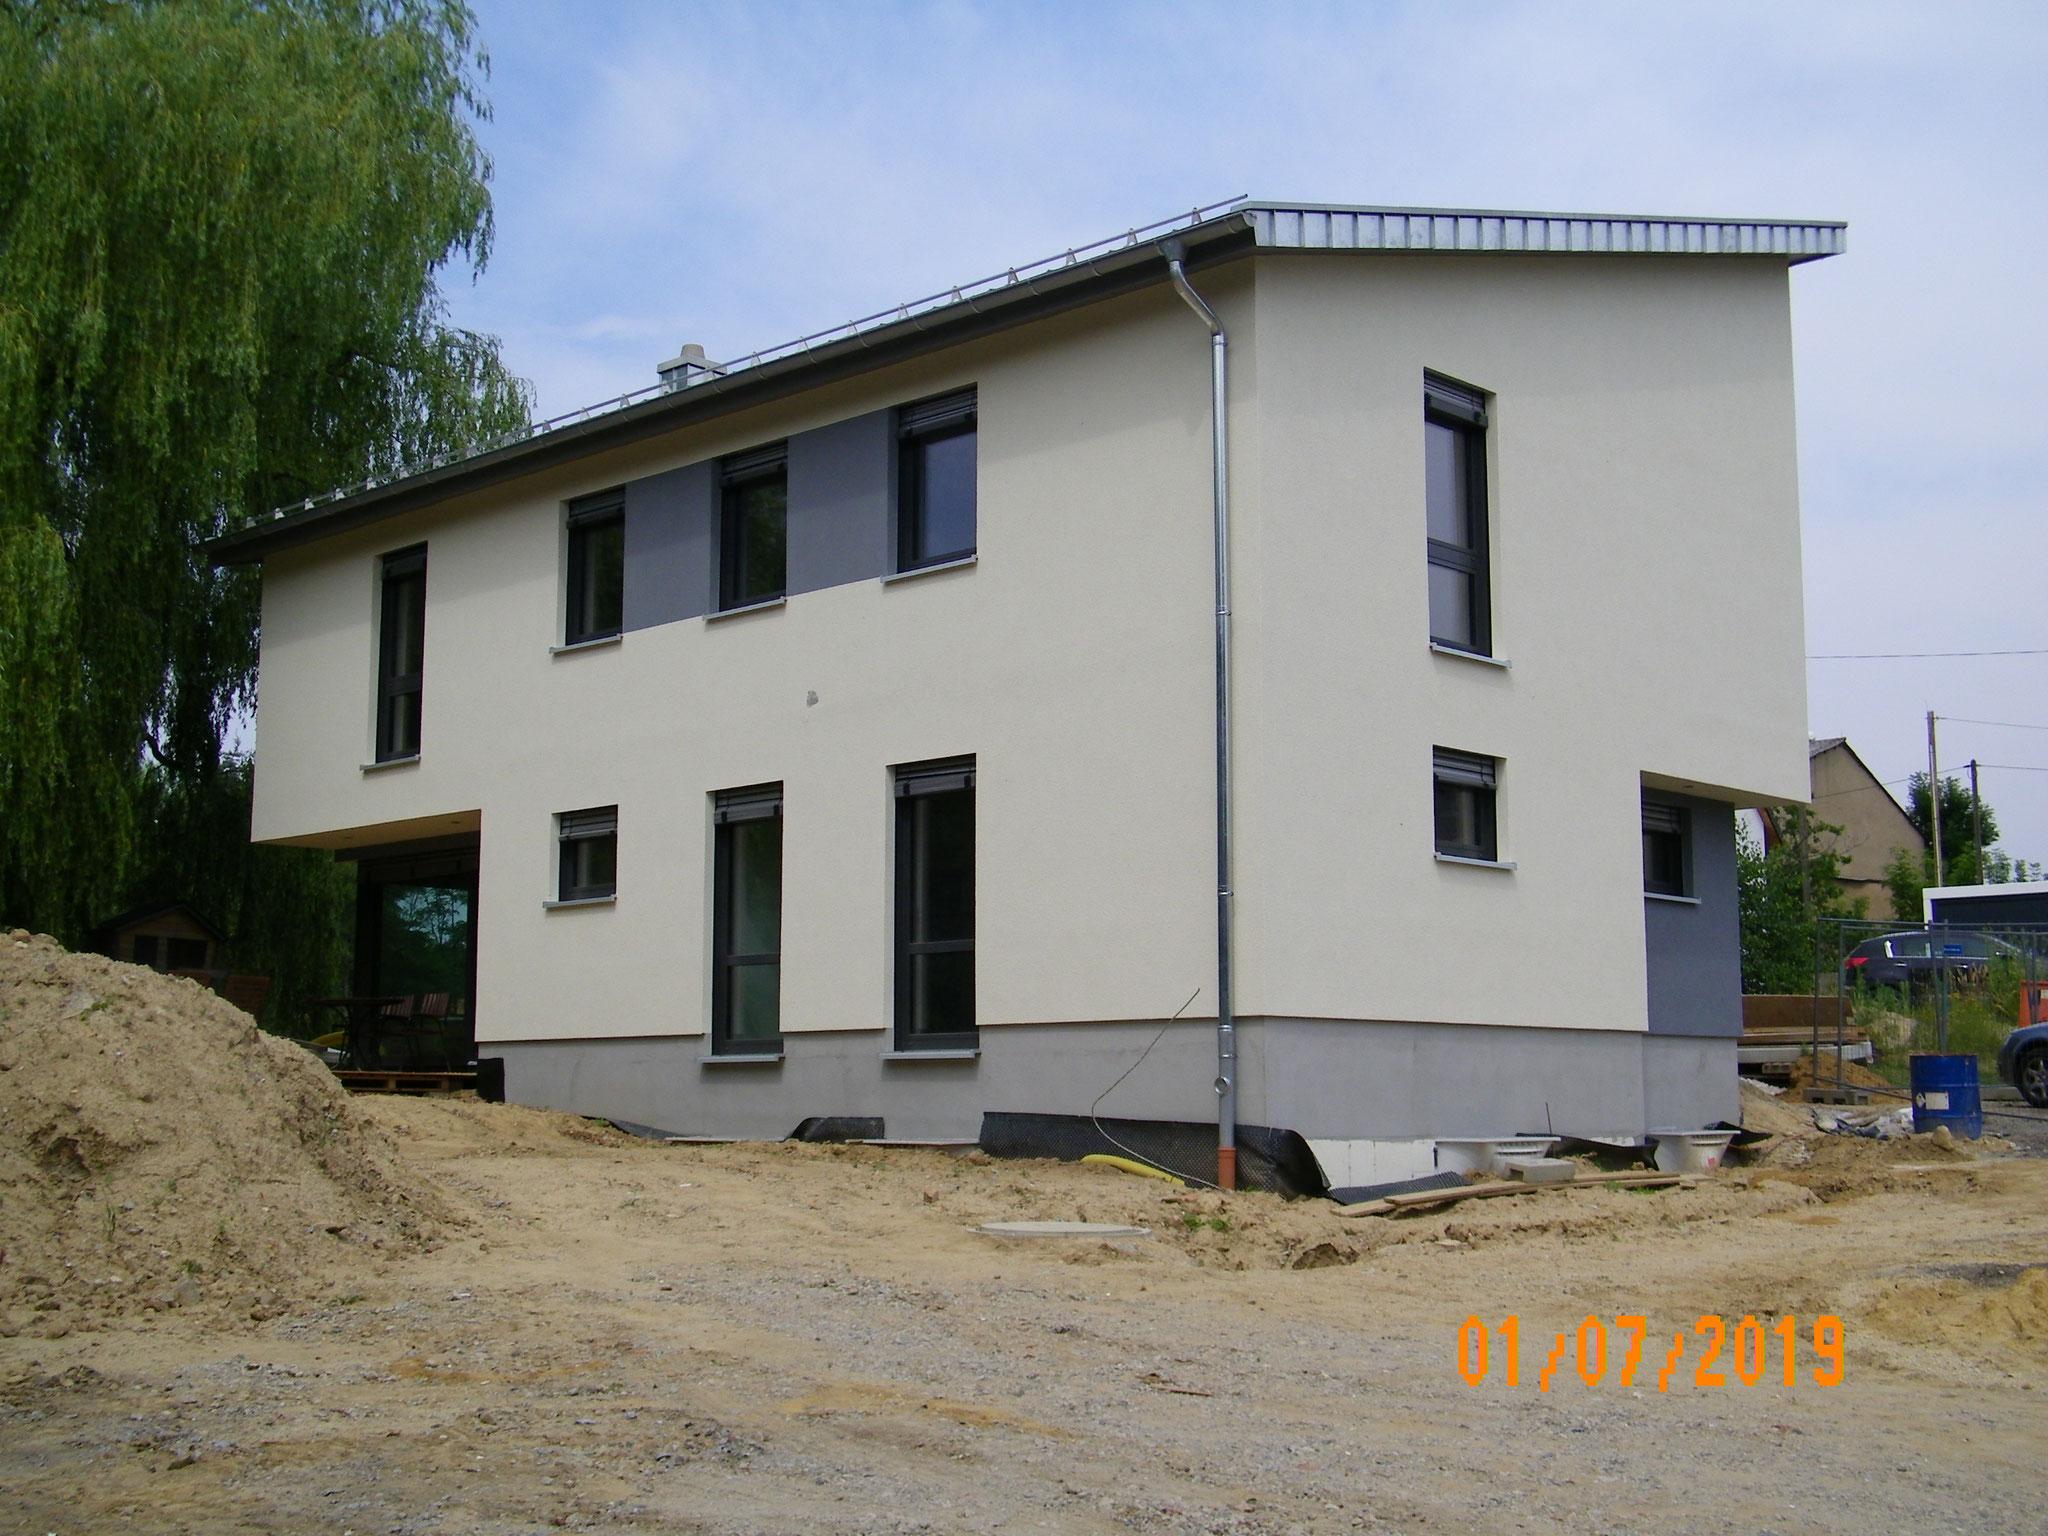 Eigenheim, Hauswalde (2018)